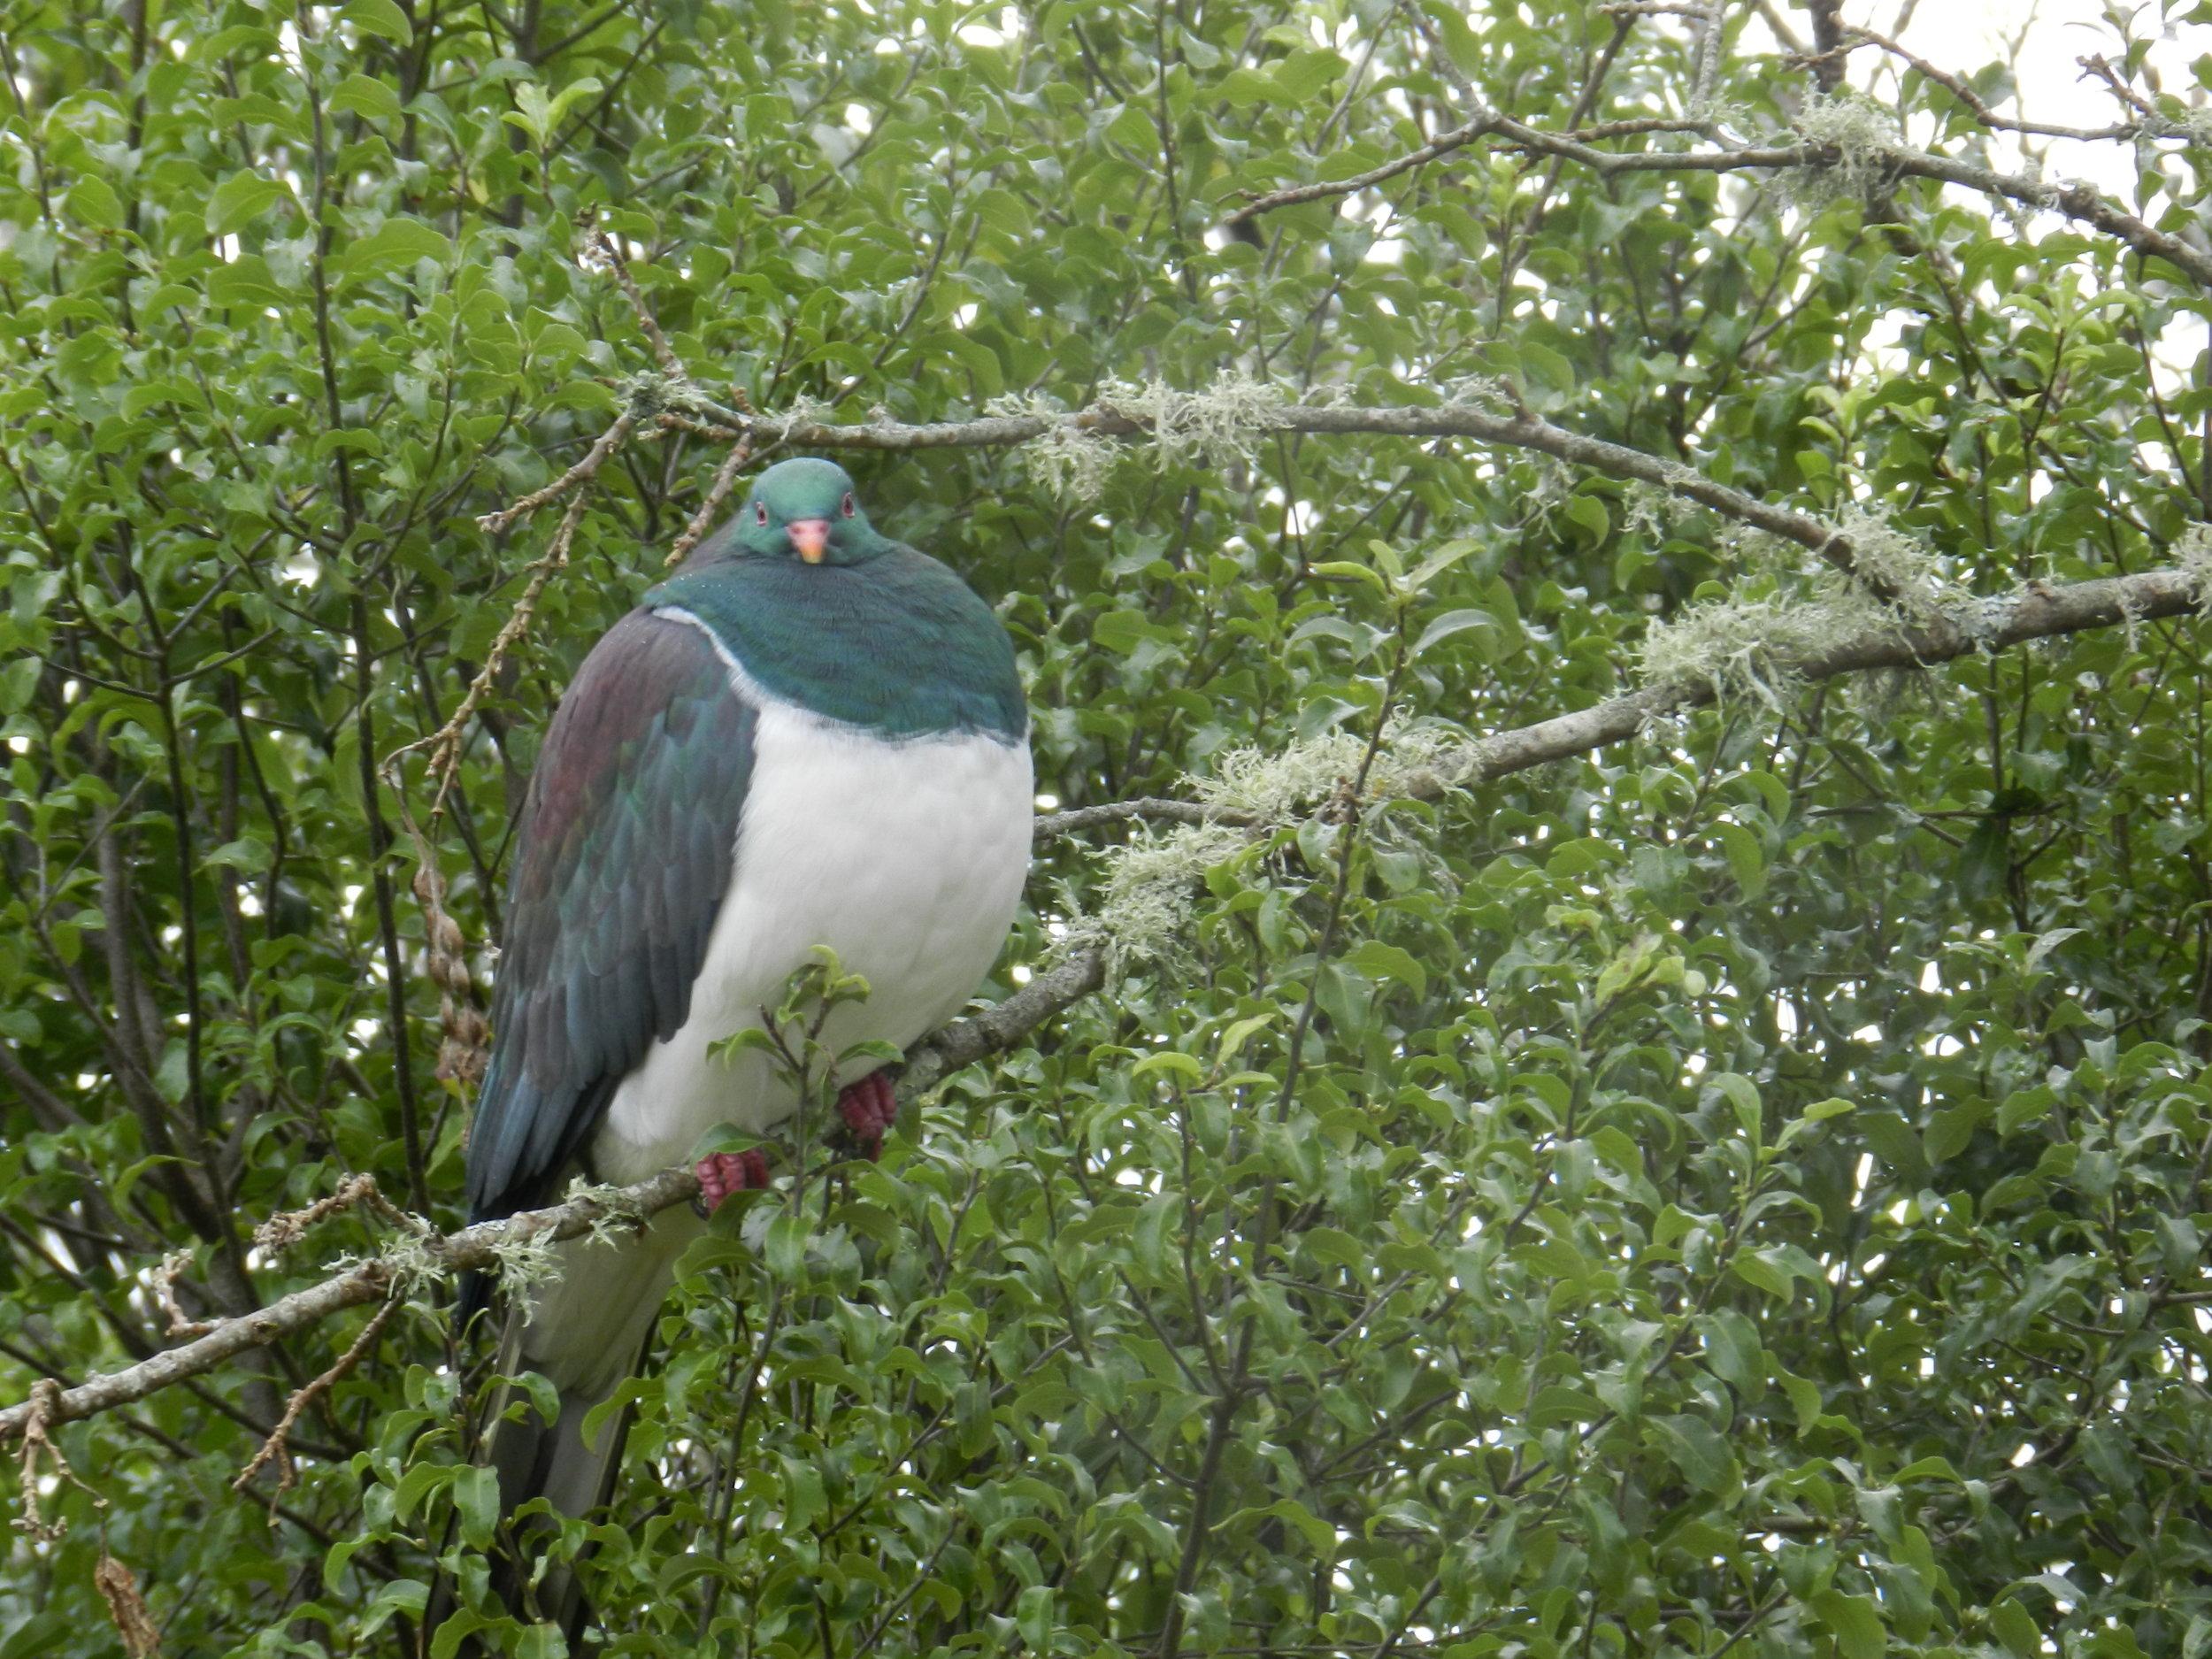 The Kereru is New Zealand's native wood pigeon. Photo by John Spavin